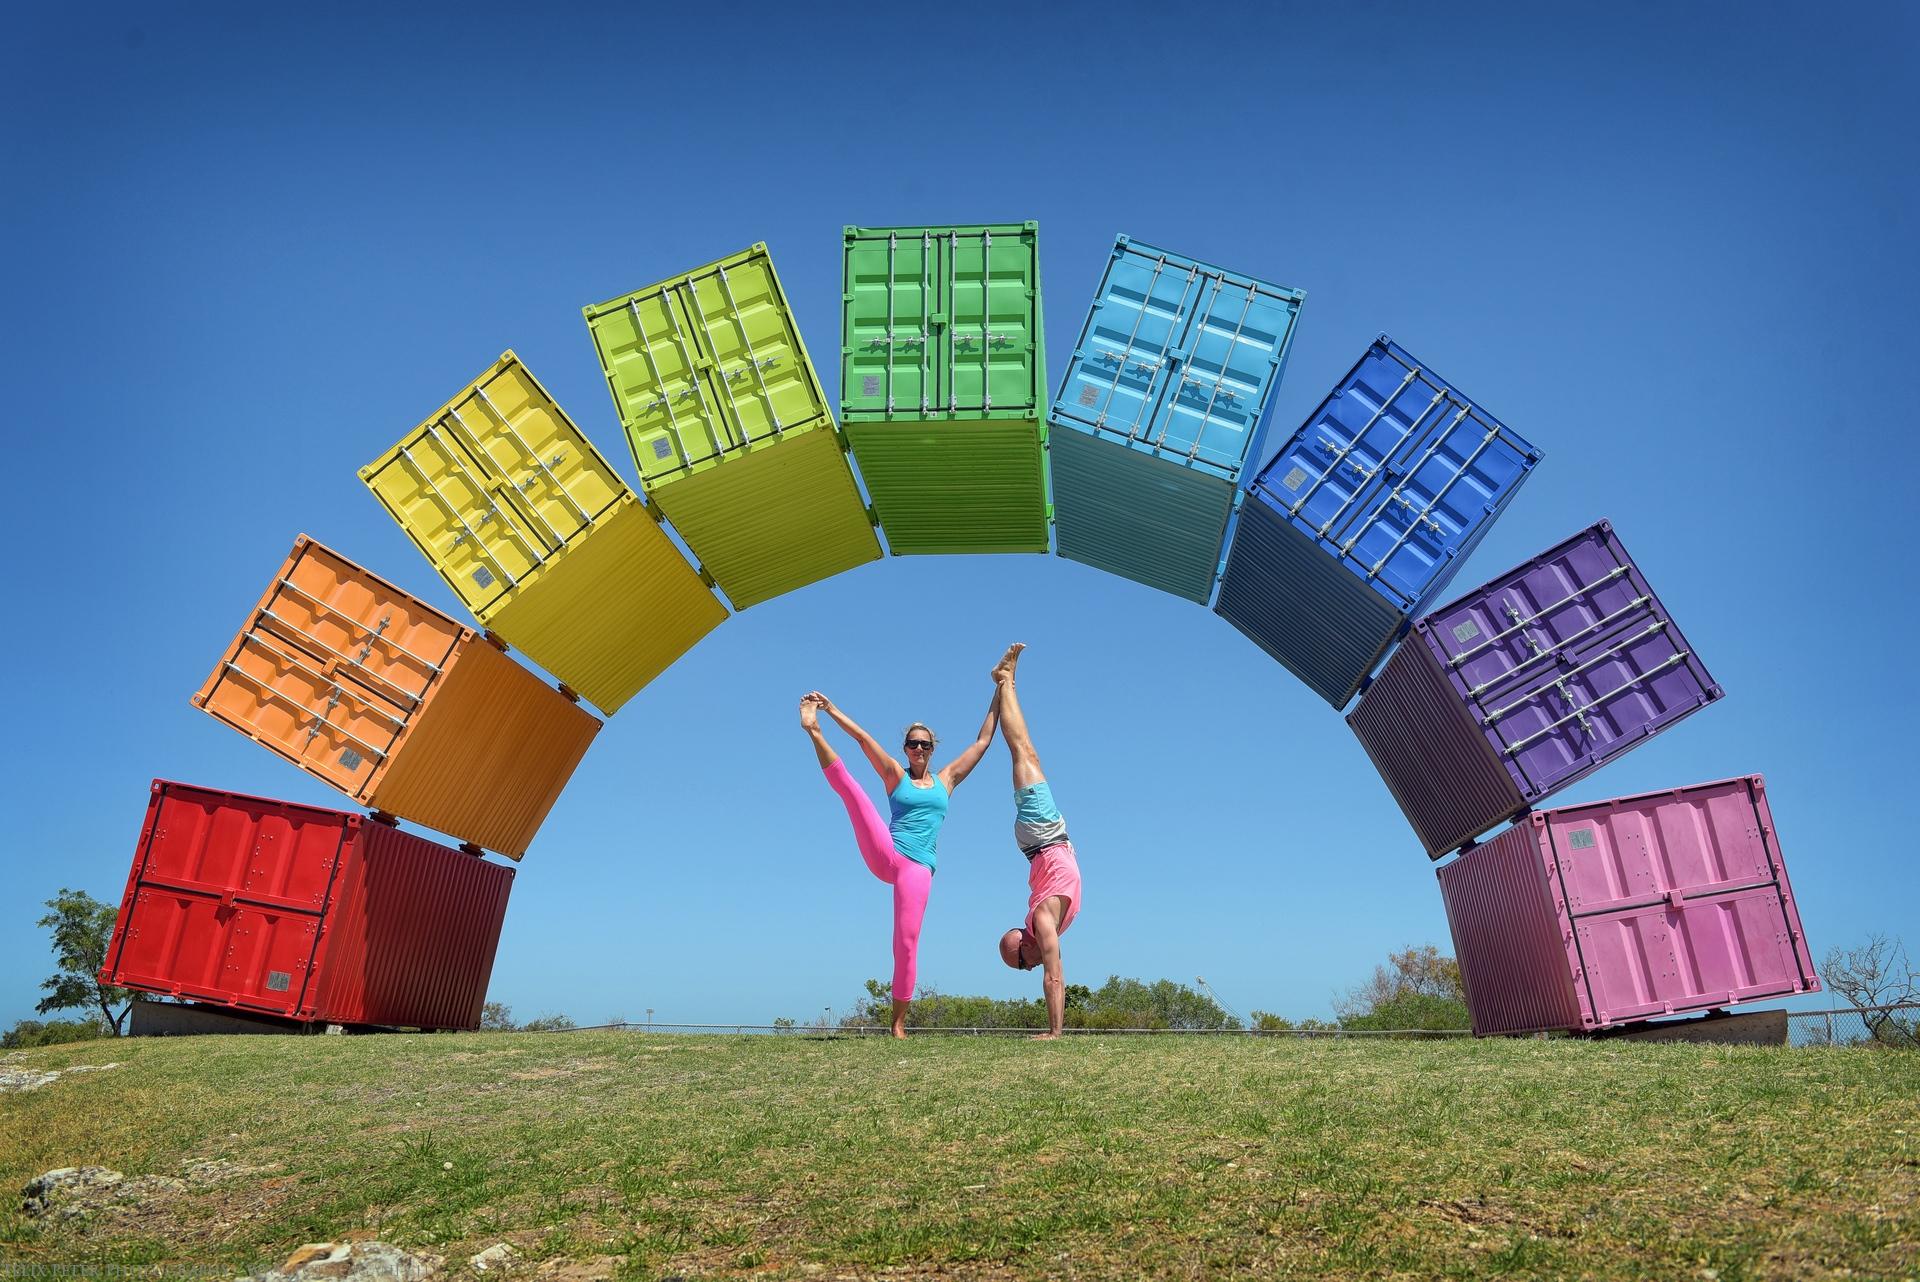 Felix-Peter-Yoga-Pilates-Dance-Fotografie_Bern_128.jpg